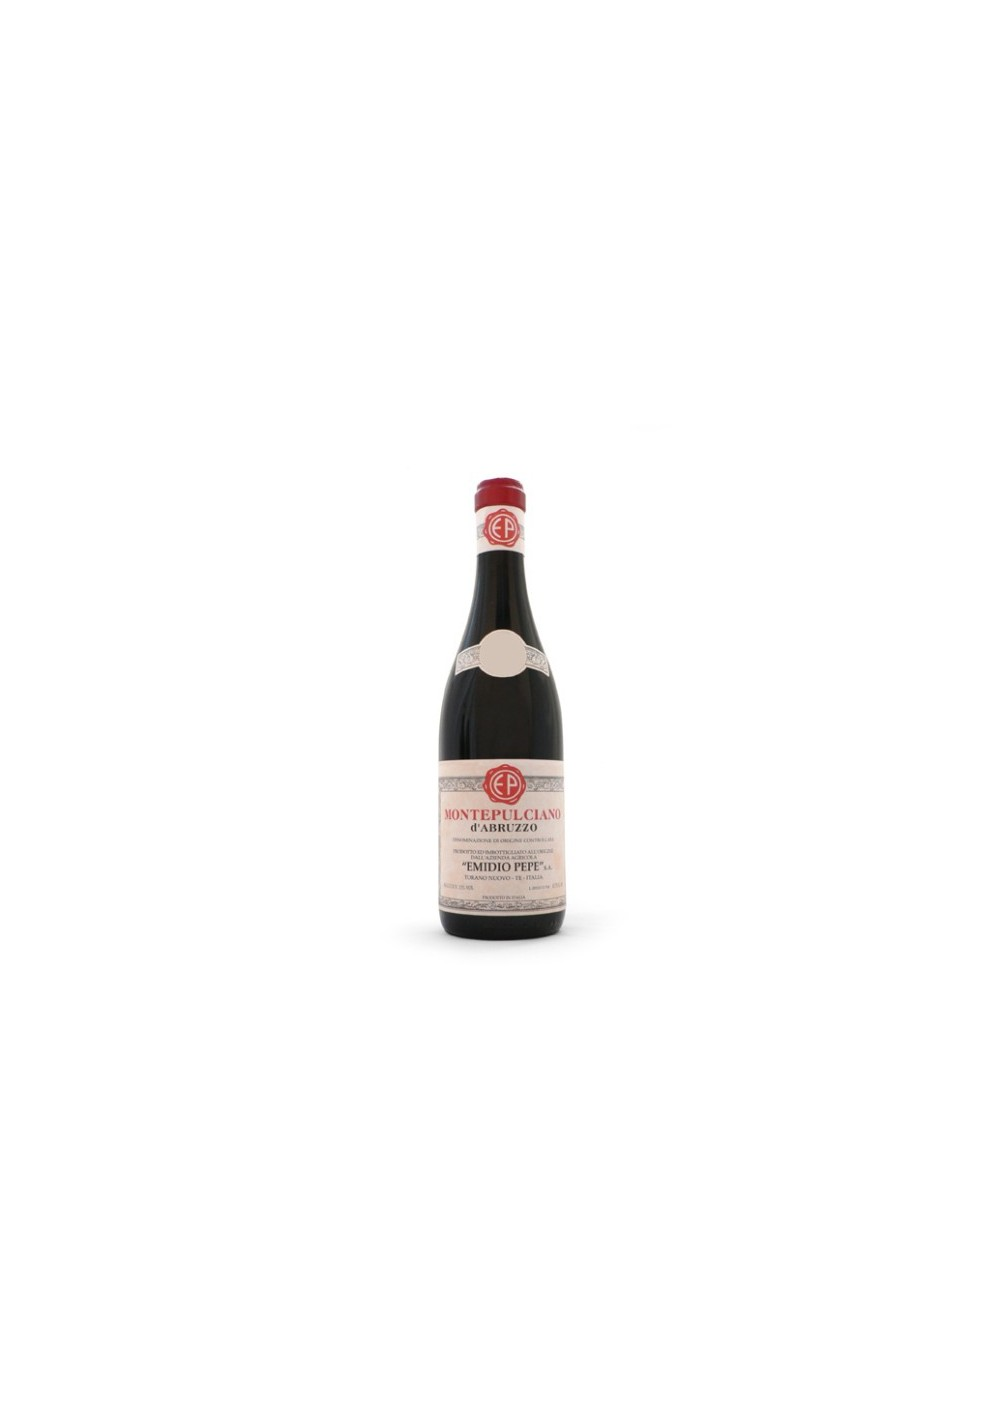 Montepulciano d'Abruzzo DOC - Emidio Pepe